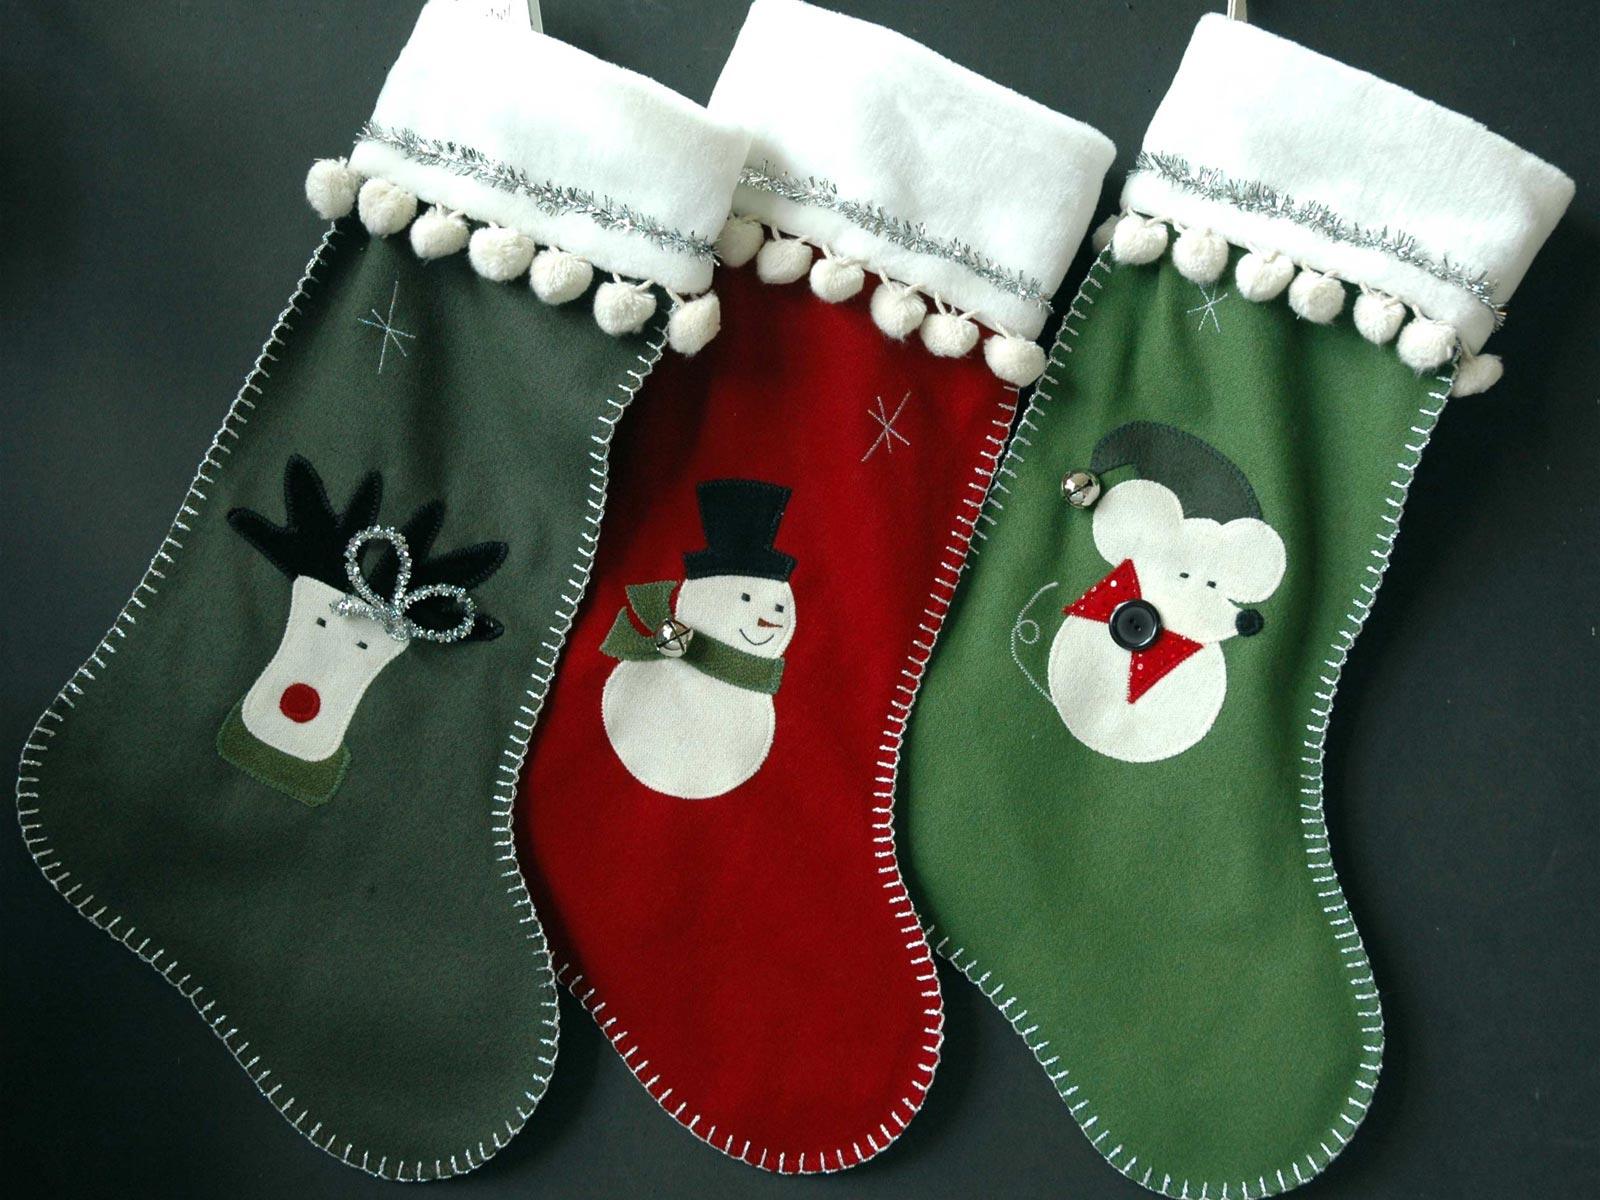 ChristmasStockings